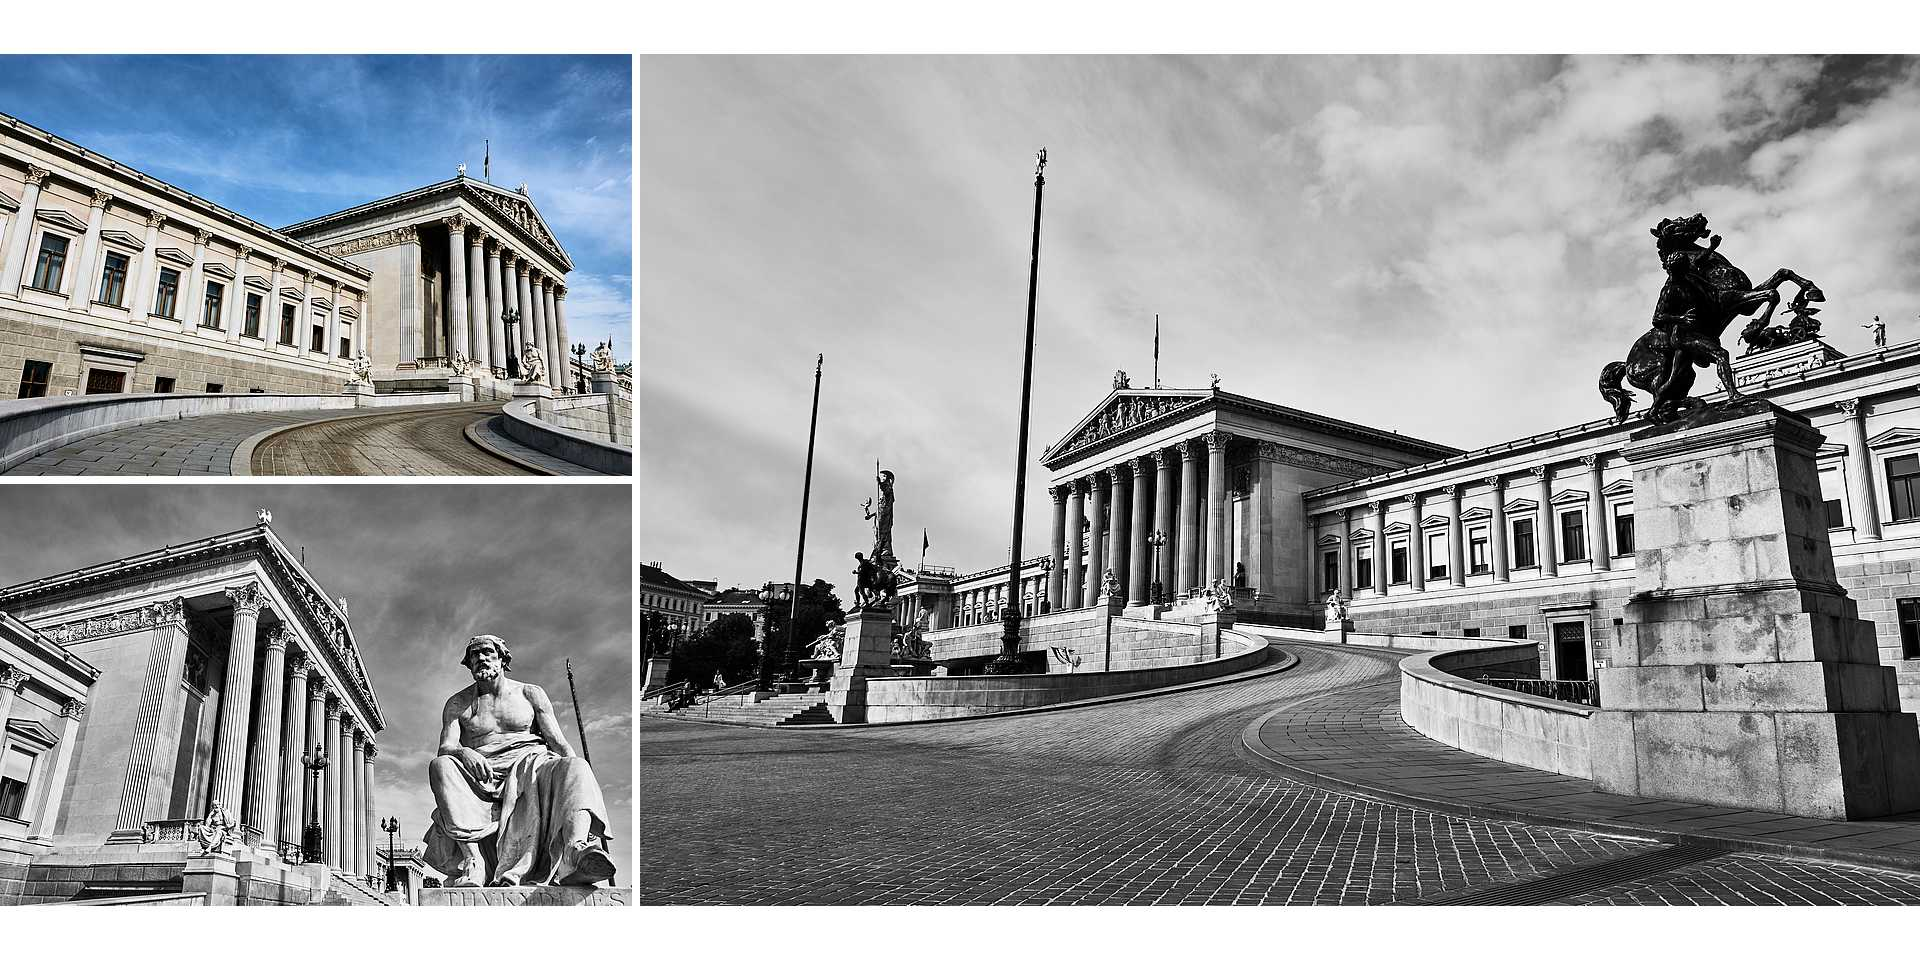 Live your Life - Descubre Viena - Ringstrasse - Parlamento de Viena